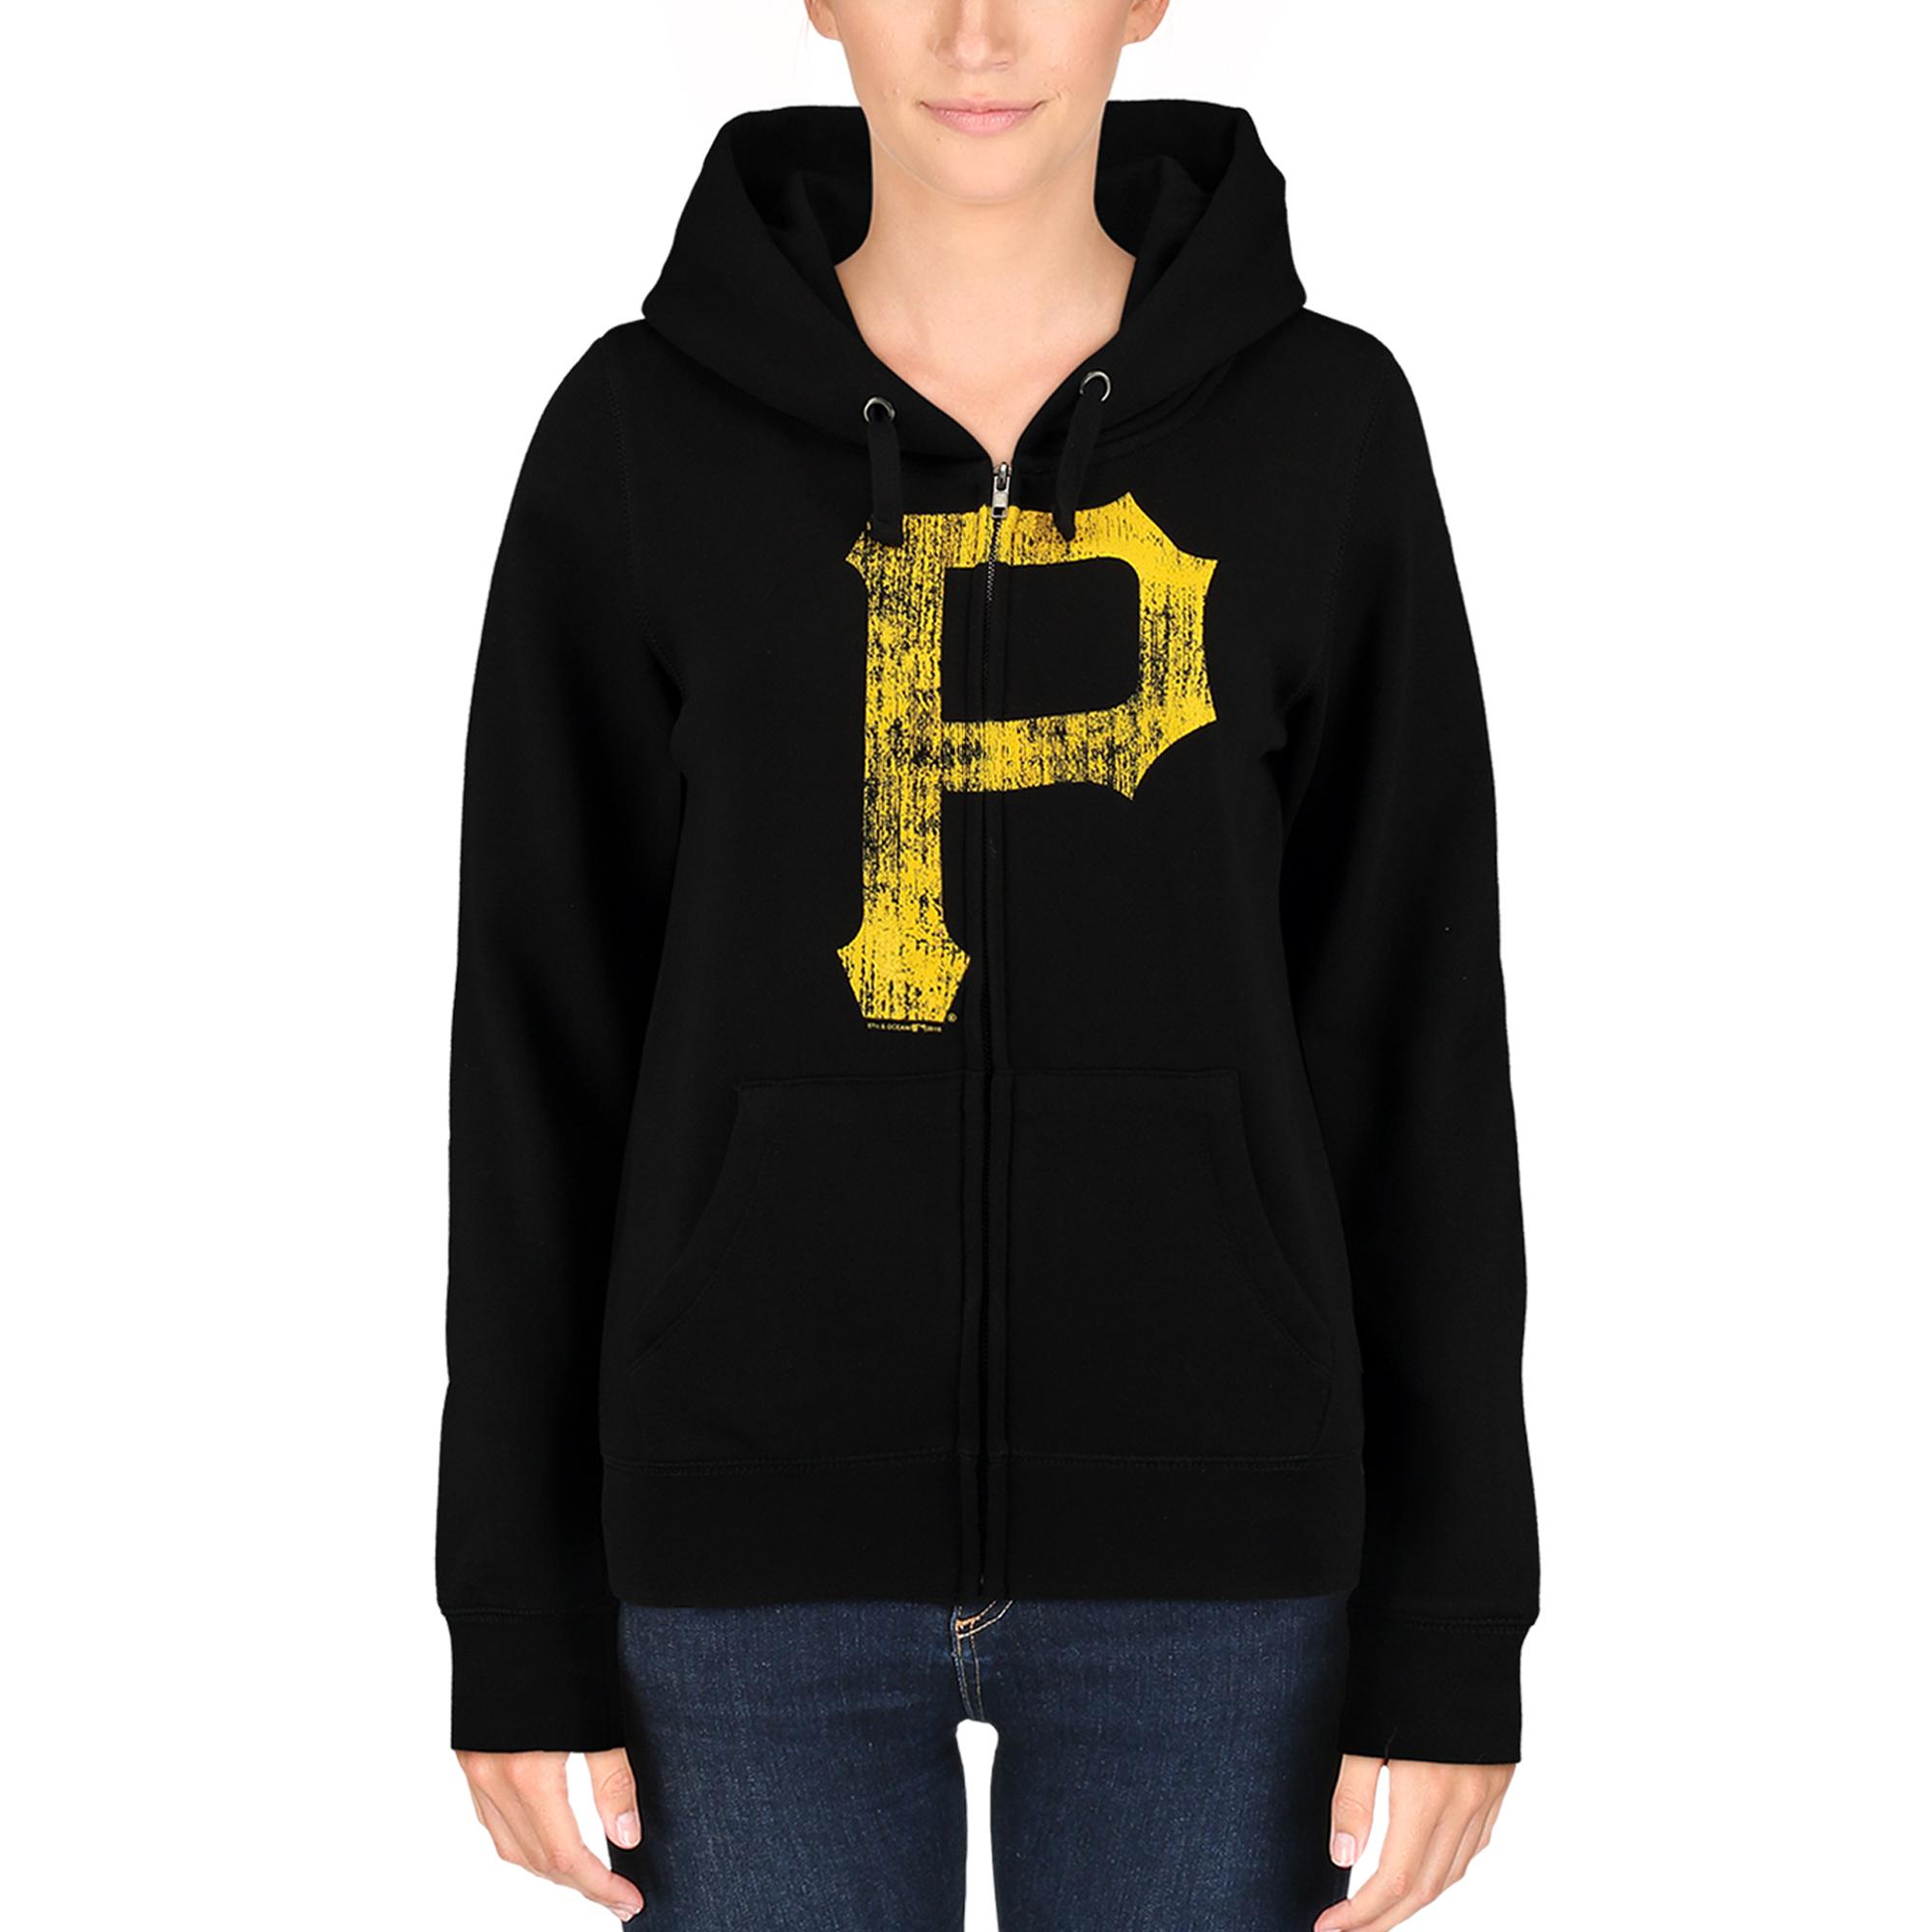 Pittsburgh Pirates 5th & Ocean by New Era Women's Core Fleece Hoodie - Black